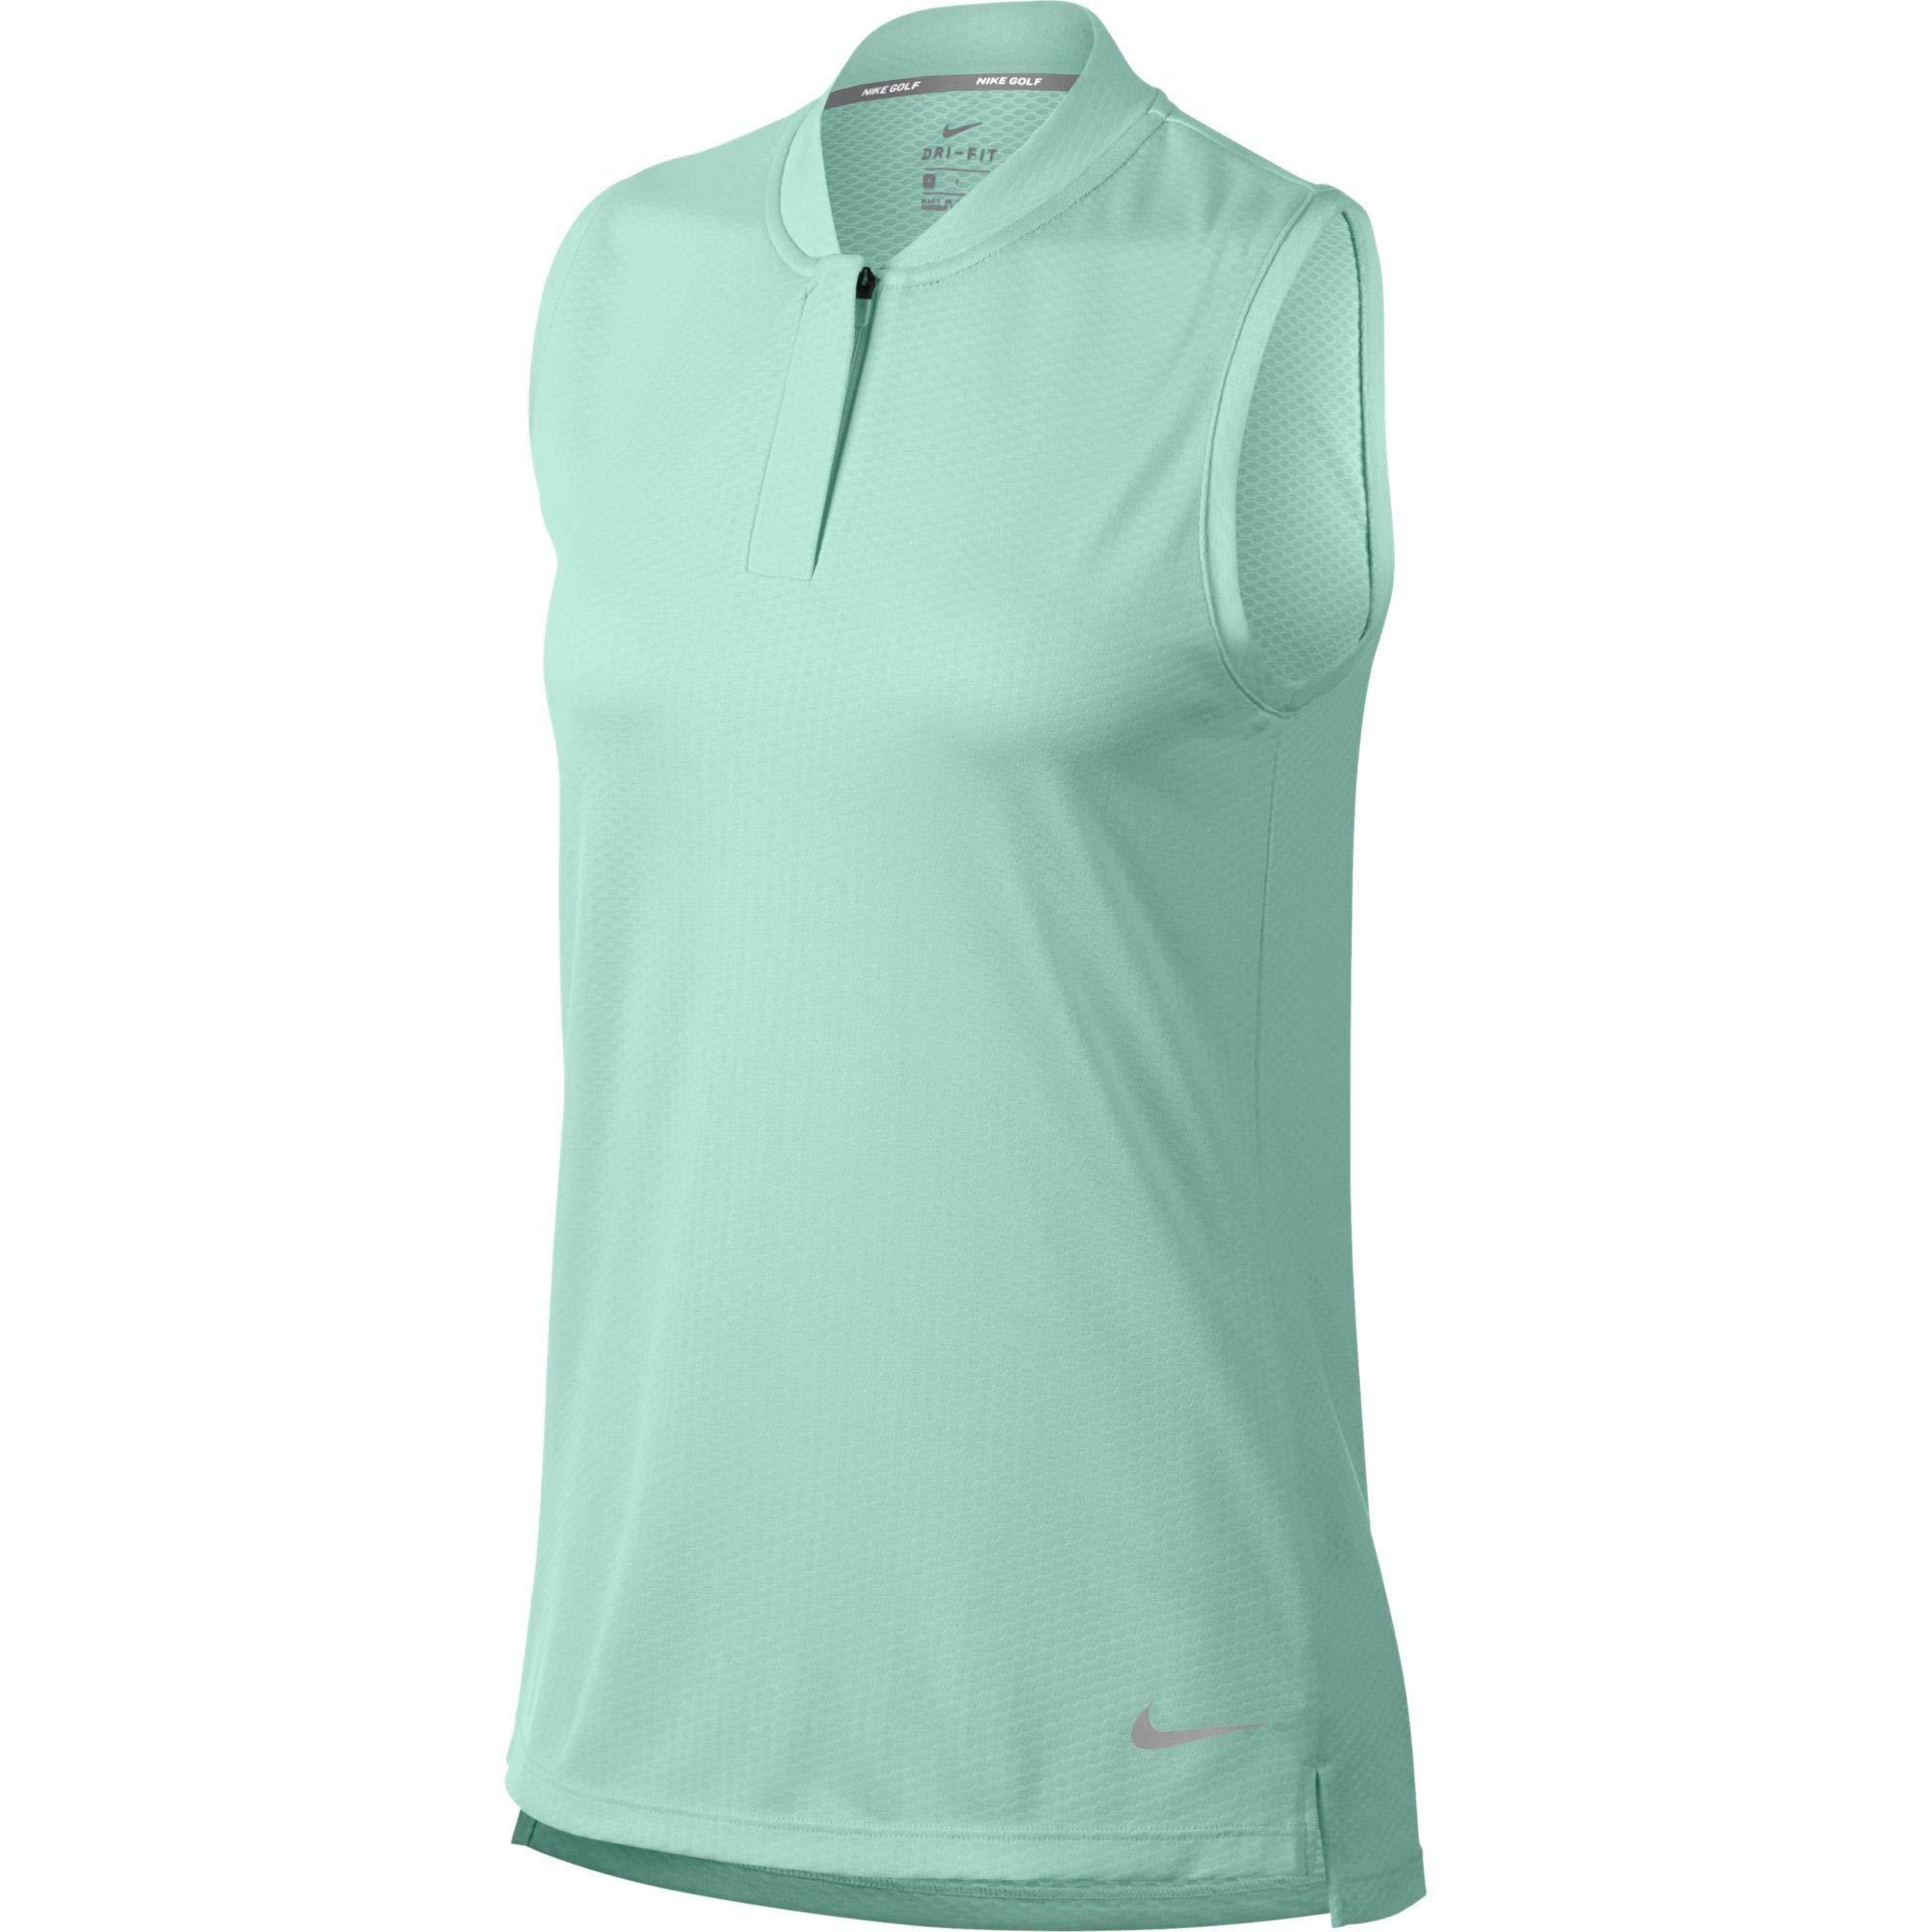 Nike Women's Sleeveless Blade Dry Golf Polo (Igloo, Small) by Nike